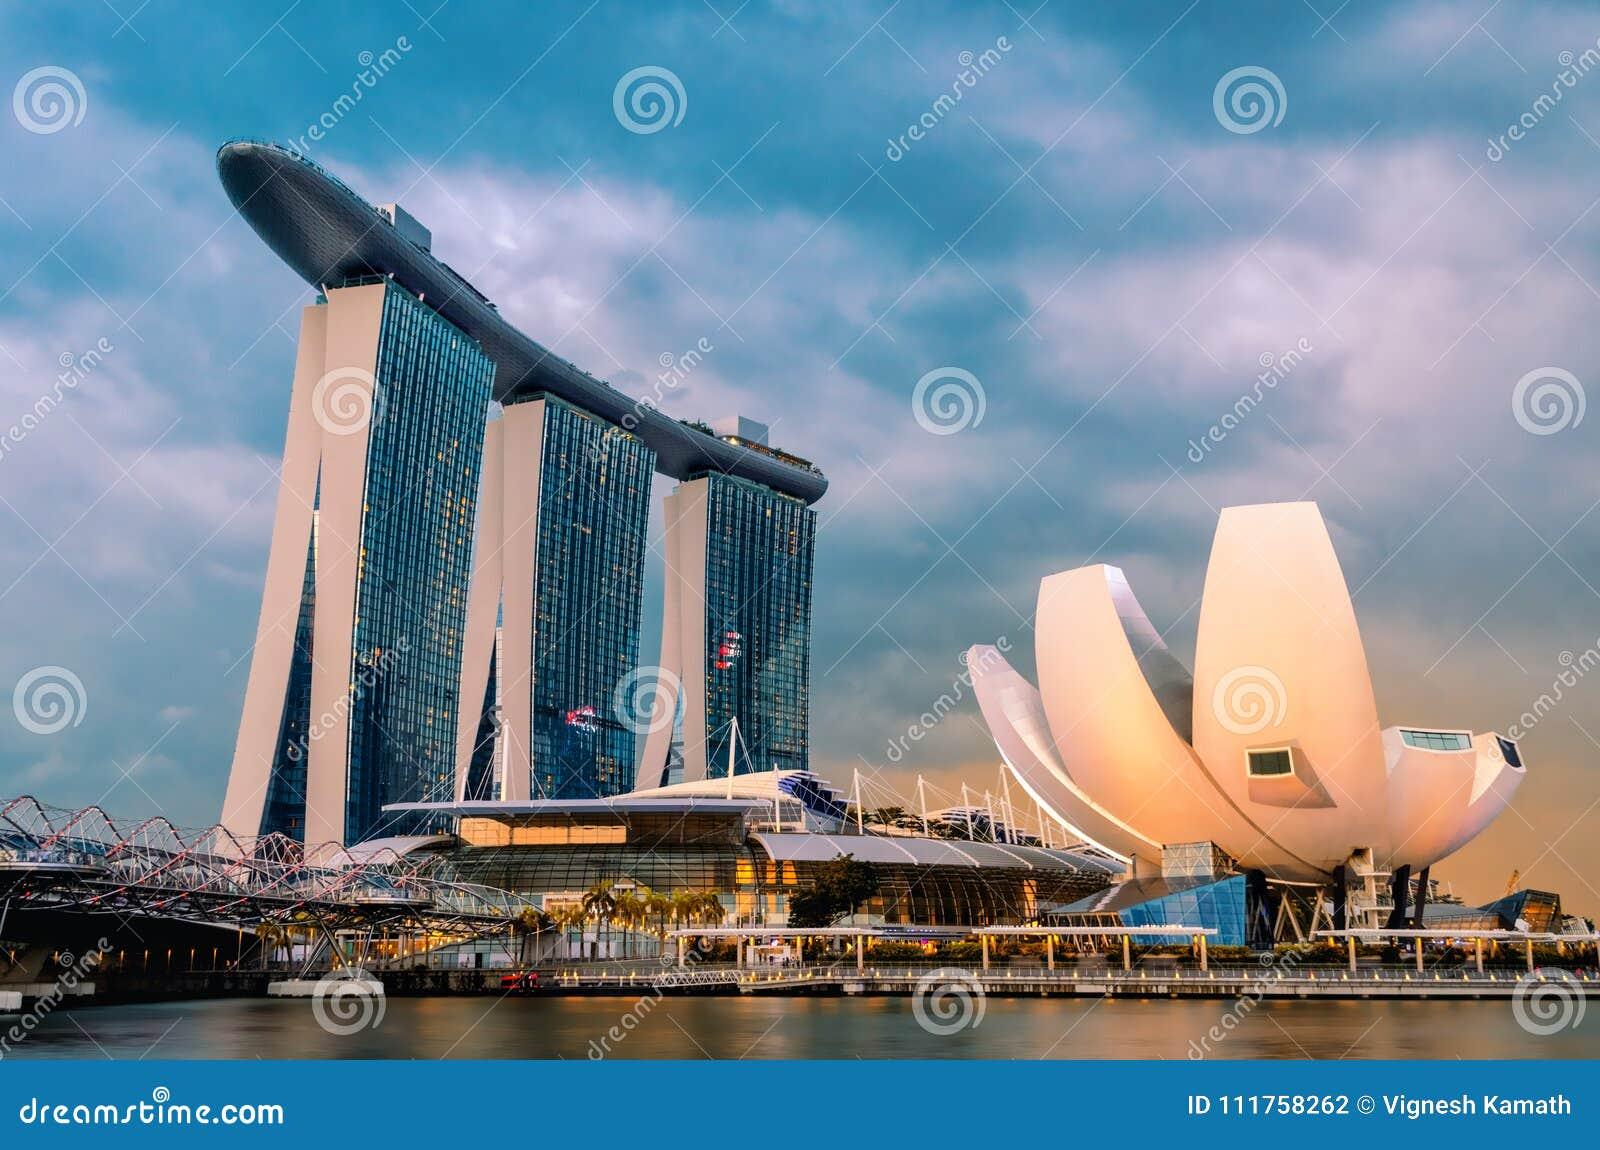 SINGAPUR 18. Januar 2018: Marina Bay Sands